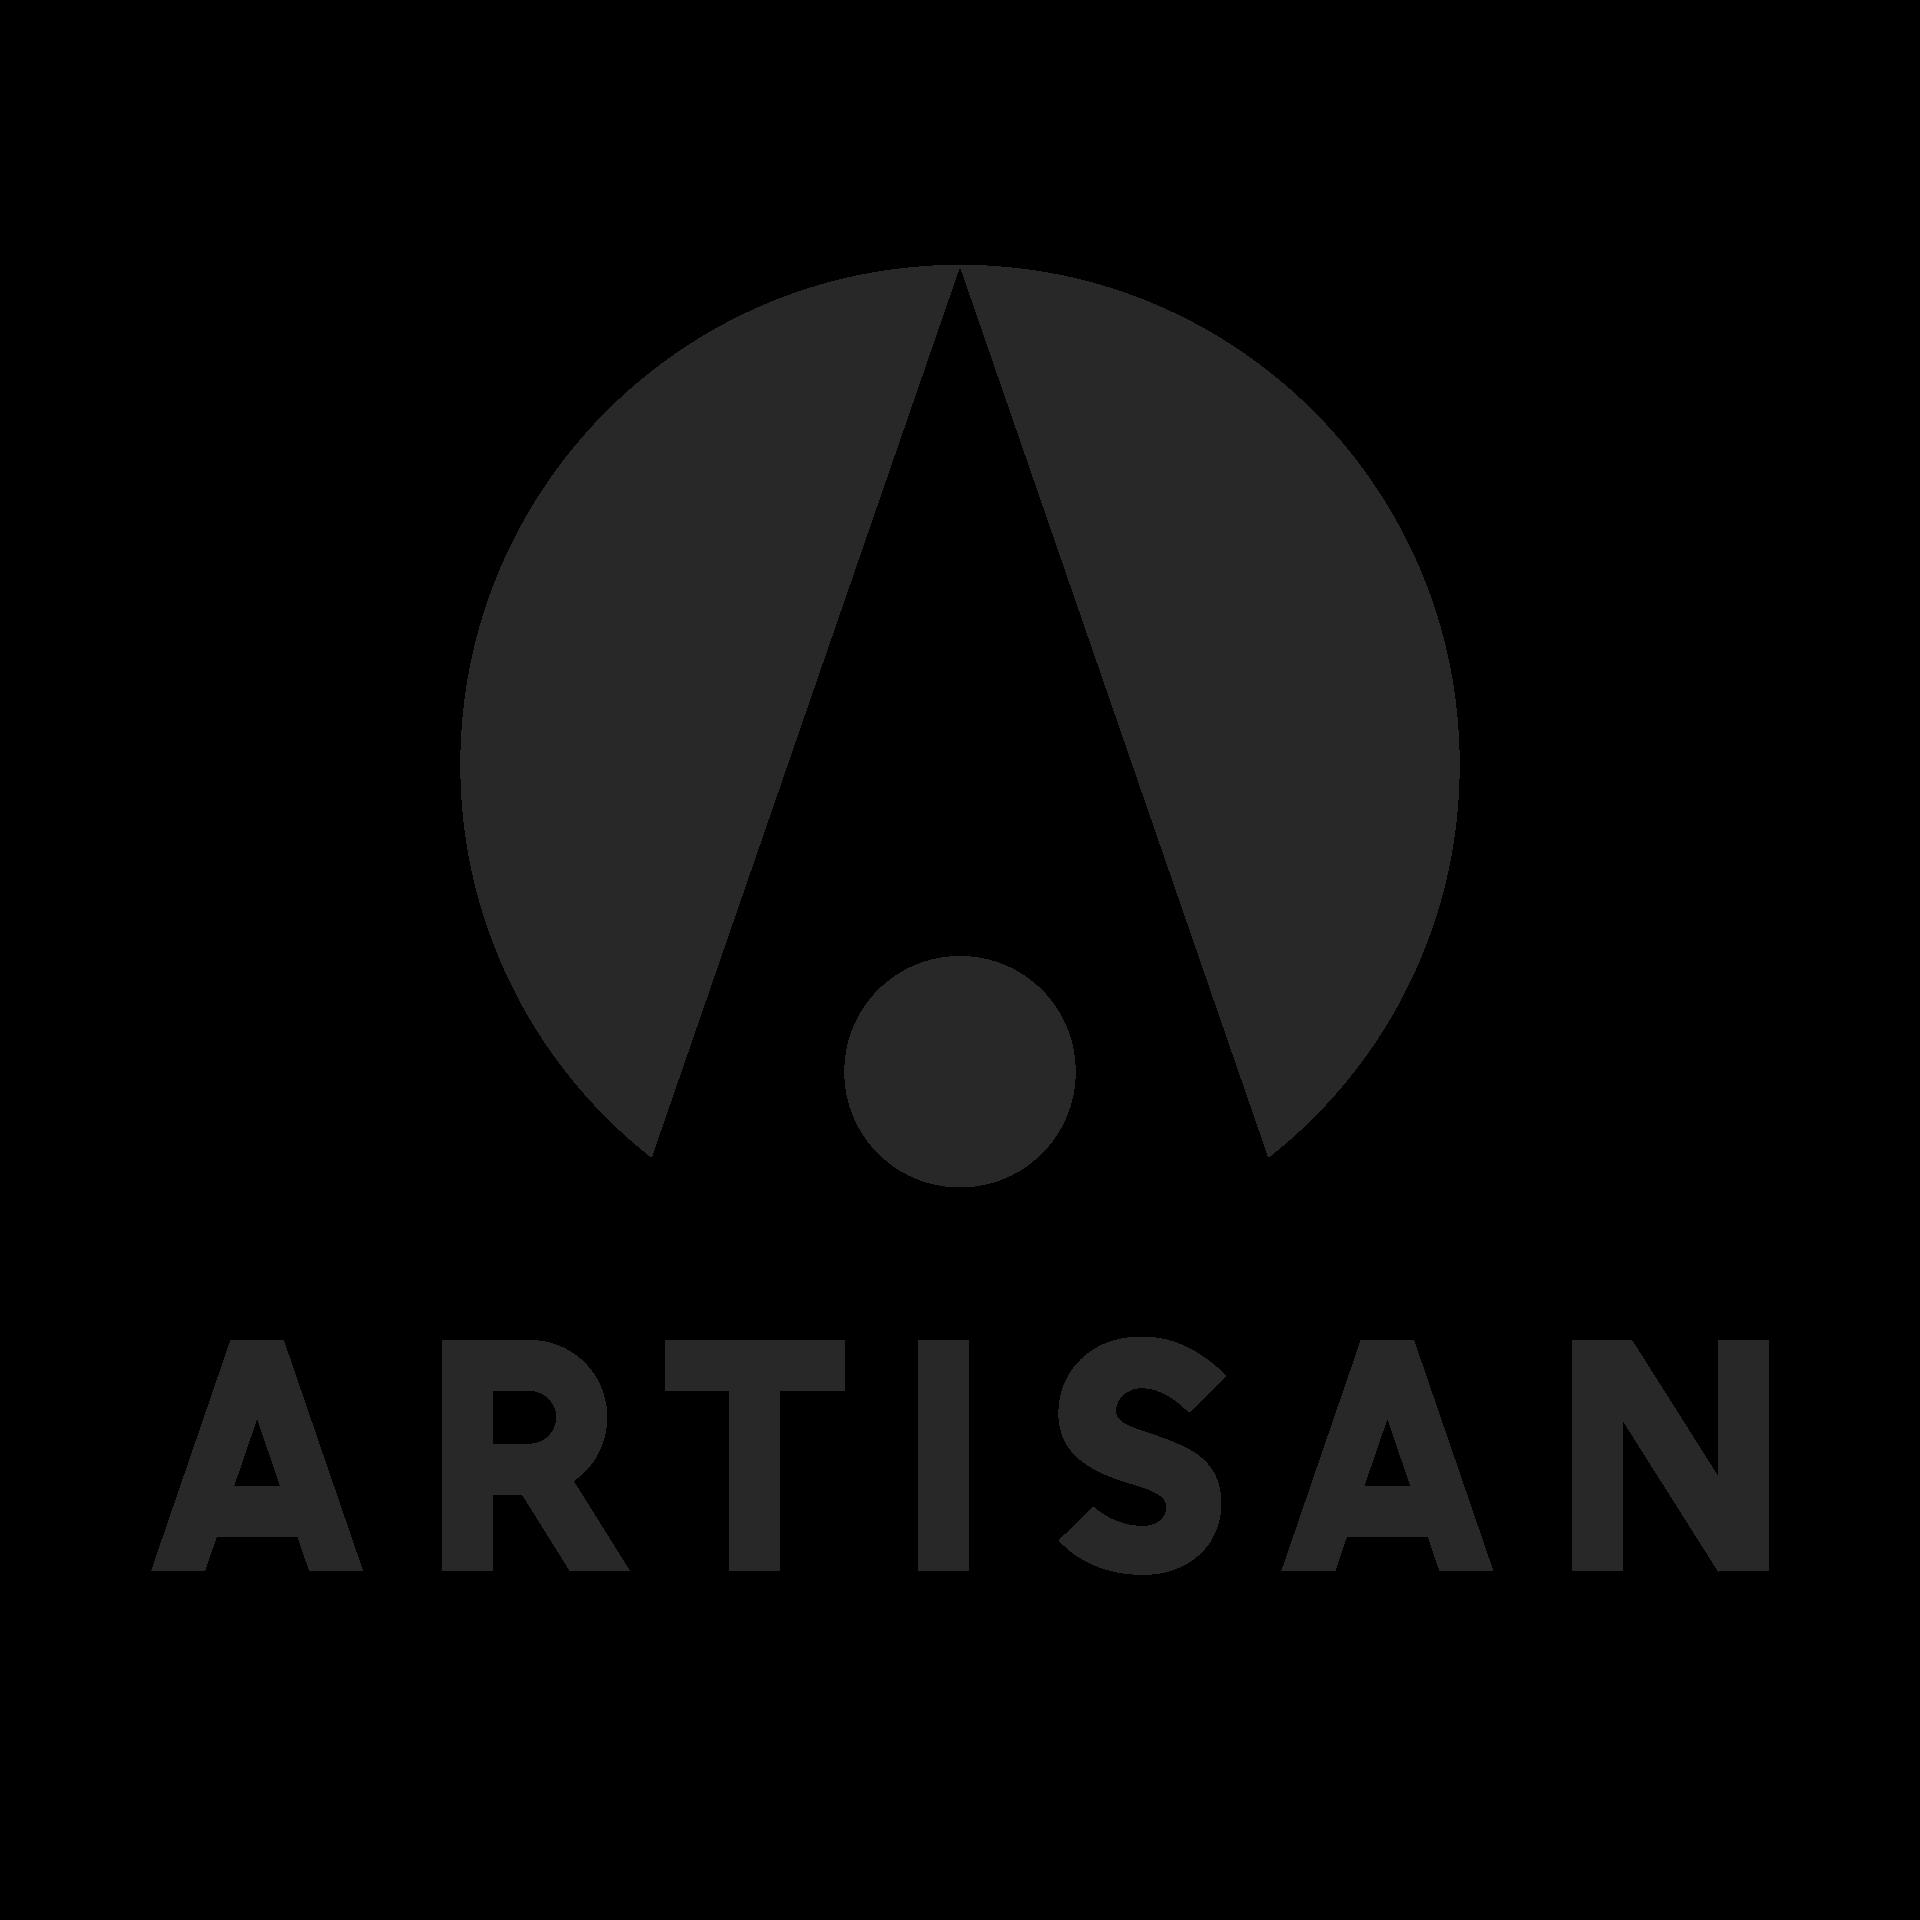 Artisan_logo_primary_inhouse_L_RGB.png